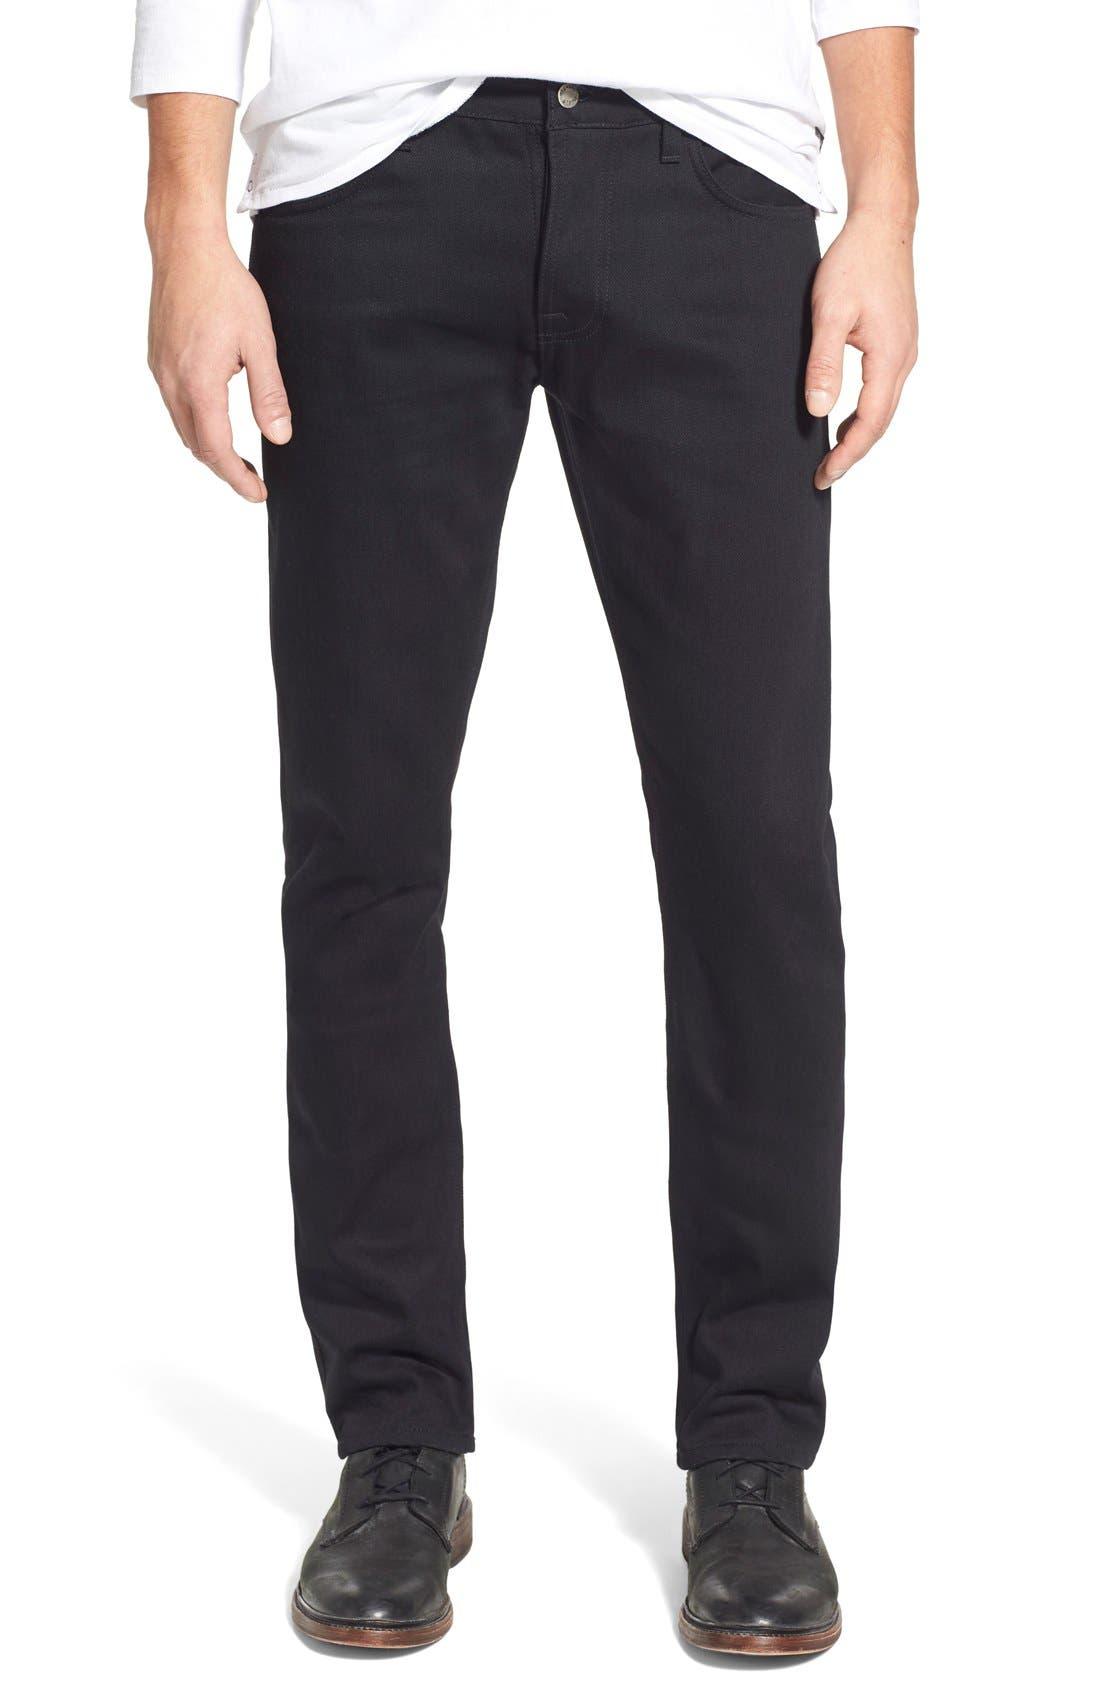 NUDIE JEANS 'Grim Tim' Slim Fit Raw Selvedge Jeans, Main, color, 001